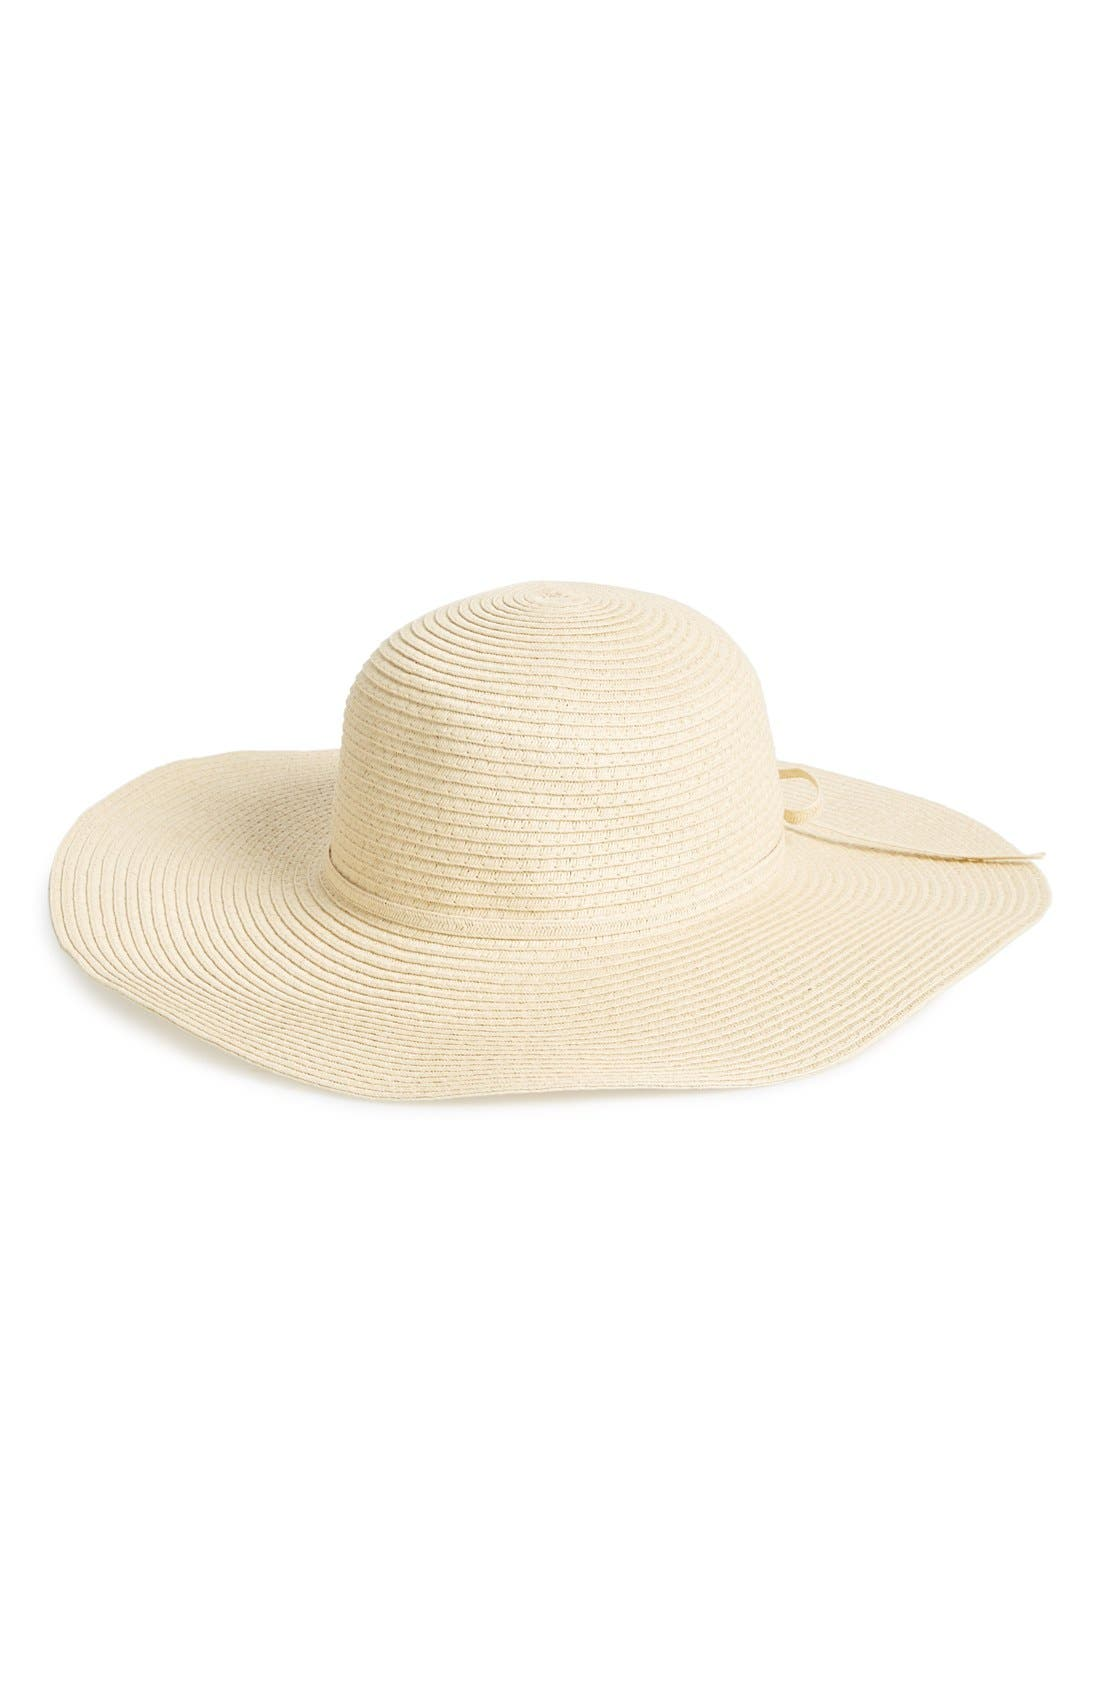 Main Image - Amici Accessories Floppy Straw Hat (Juniors)